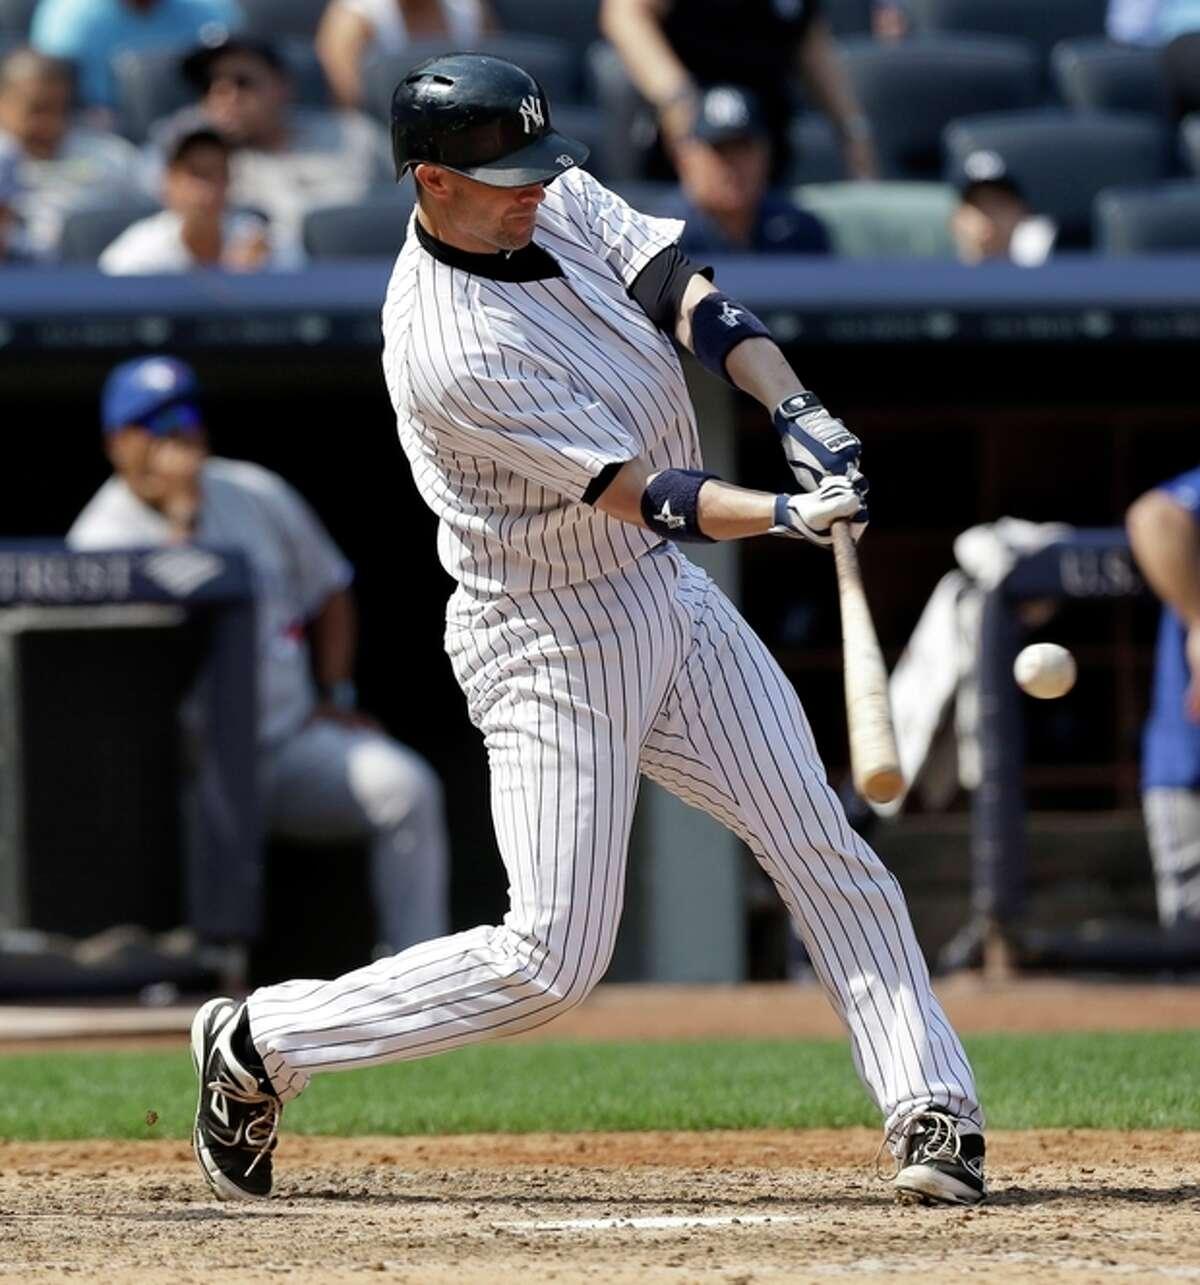 New York Yankees' Chris Stewart hits a three-run homer during the sixth inning of the baseball game against the Toronto Blue Jays at Yankee Stadium Tuesday, Aug. 20, 2013 in New York. (AP Photo/Seth Wenig)